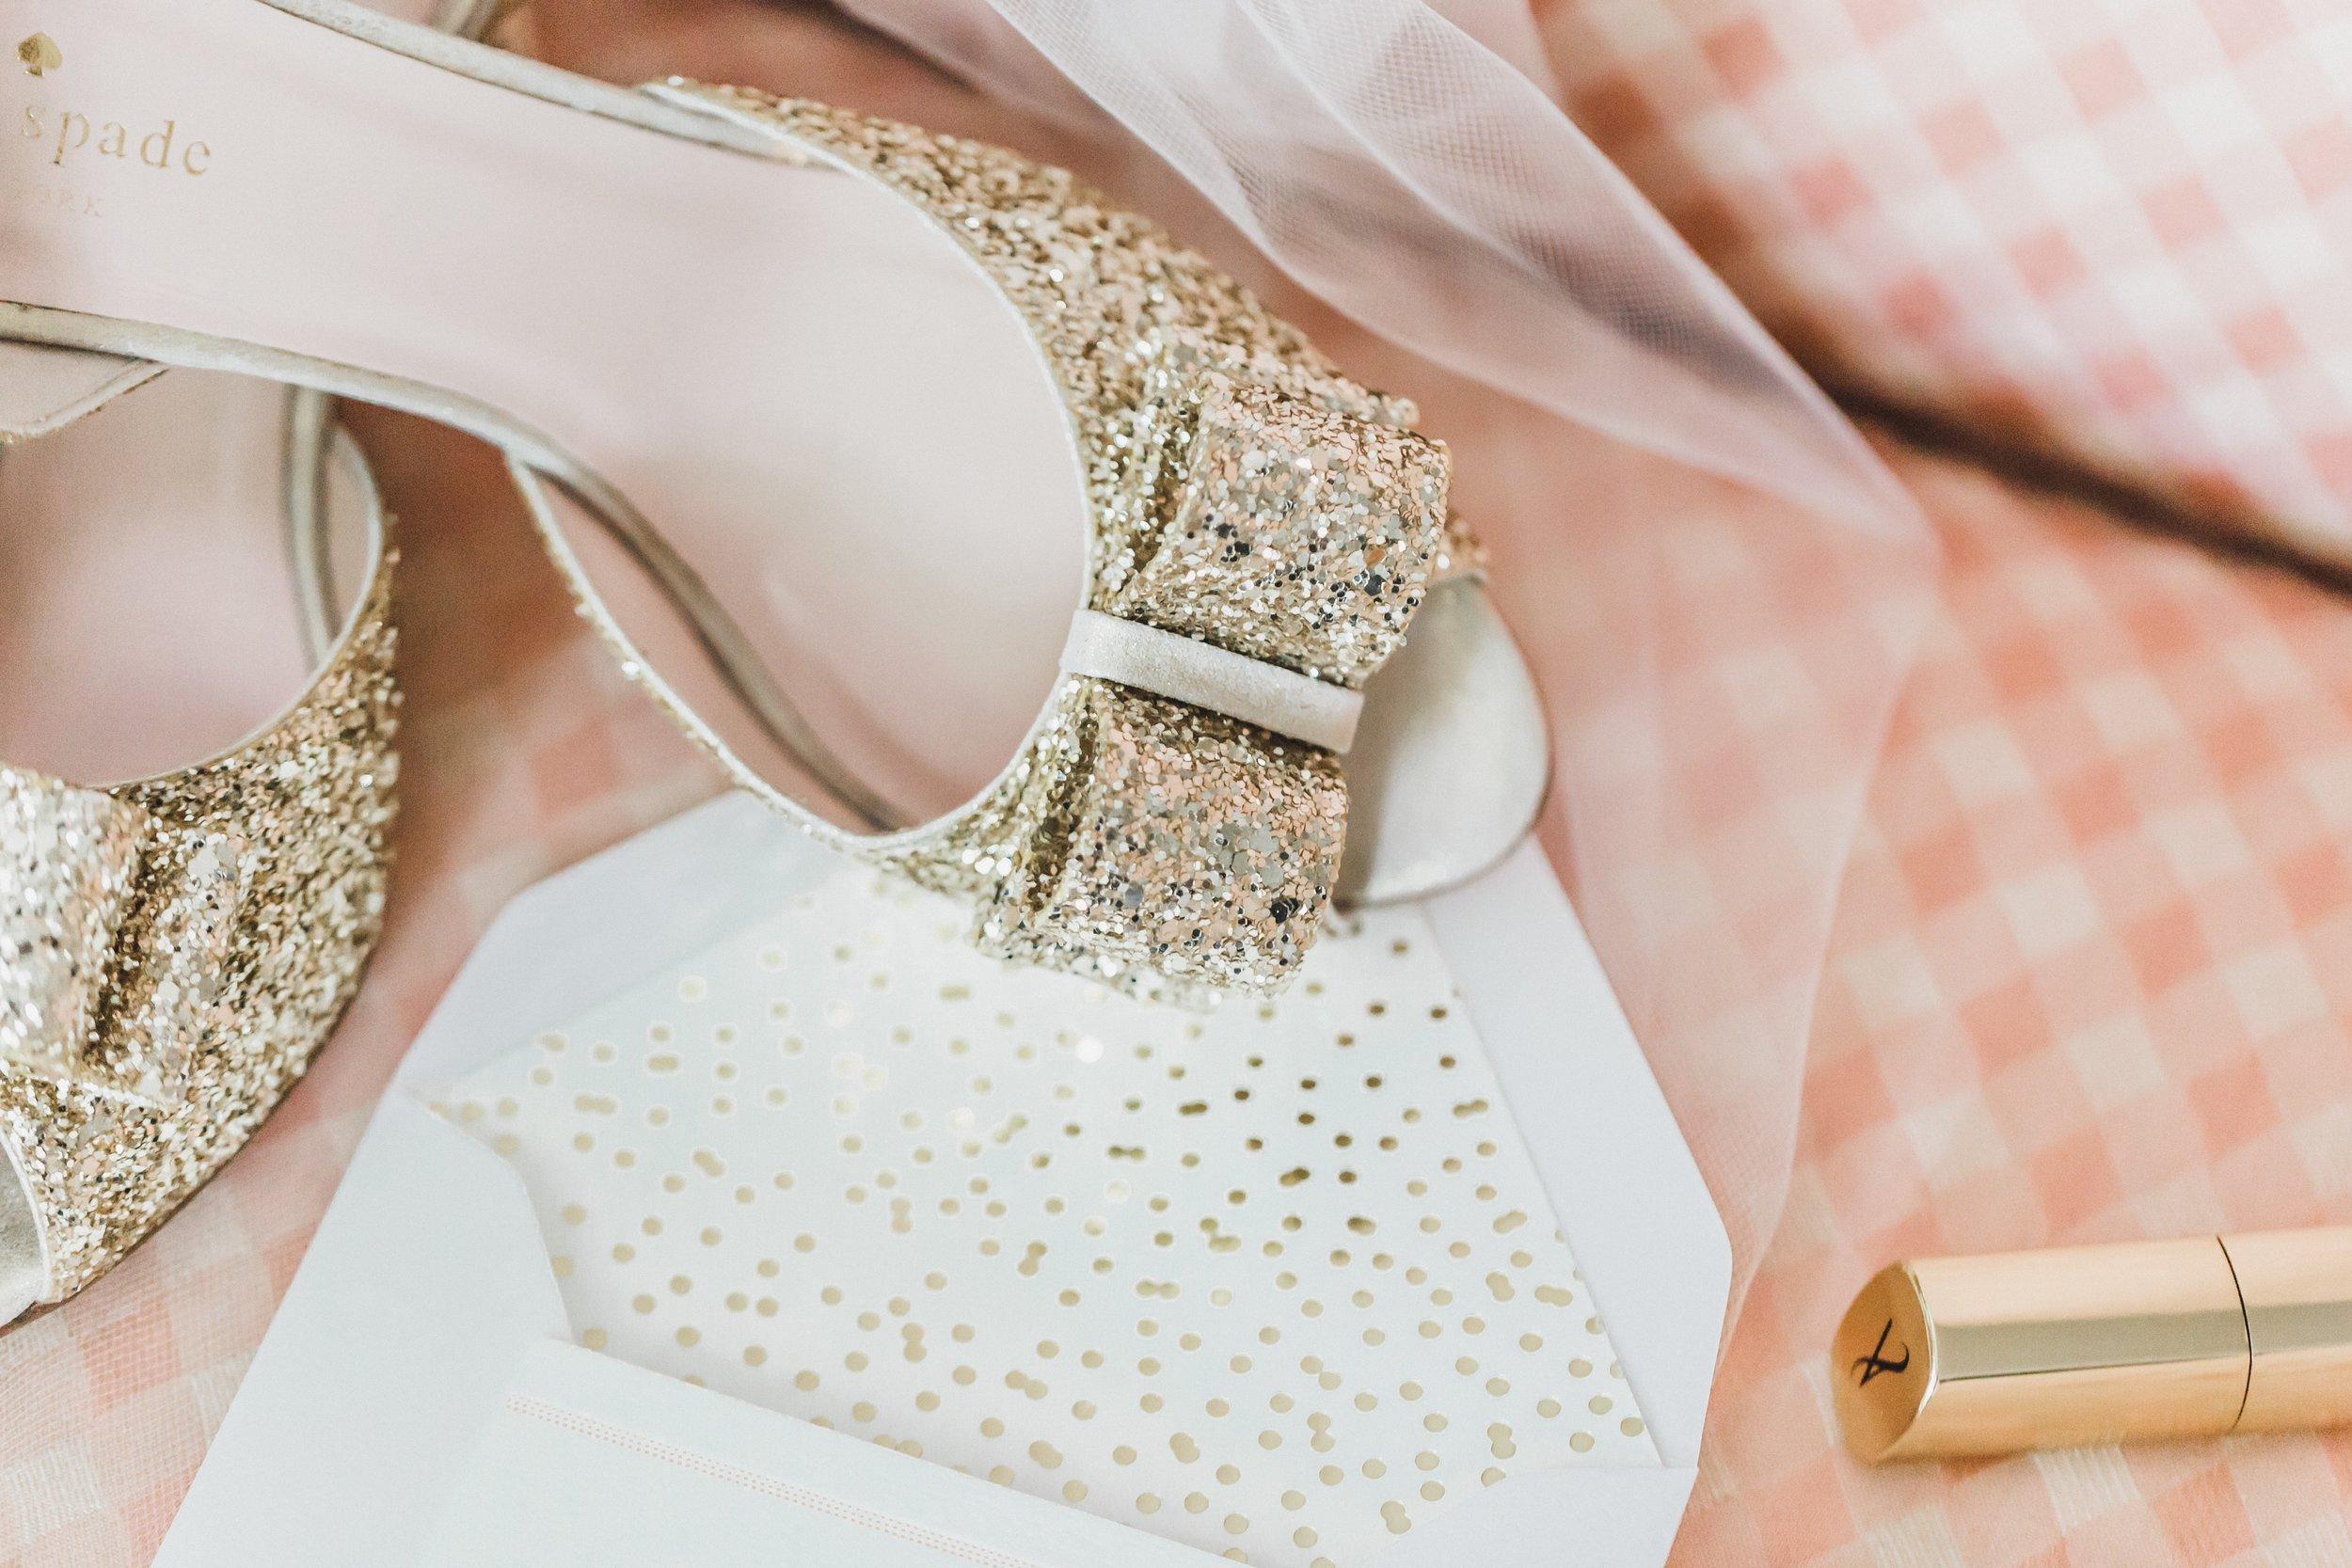 nathan-jessica-wedding-22- jennifergulleyphotography.jpg